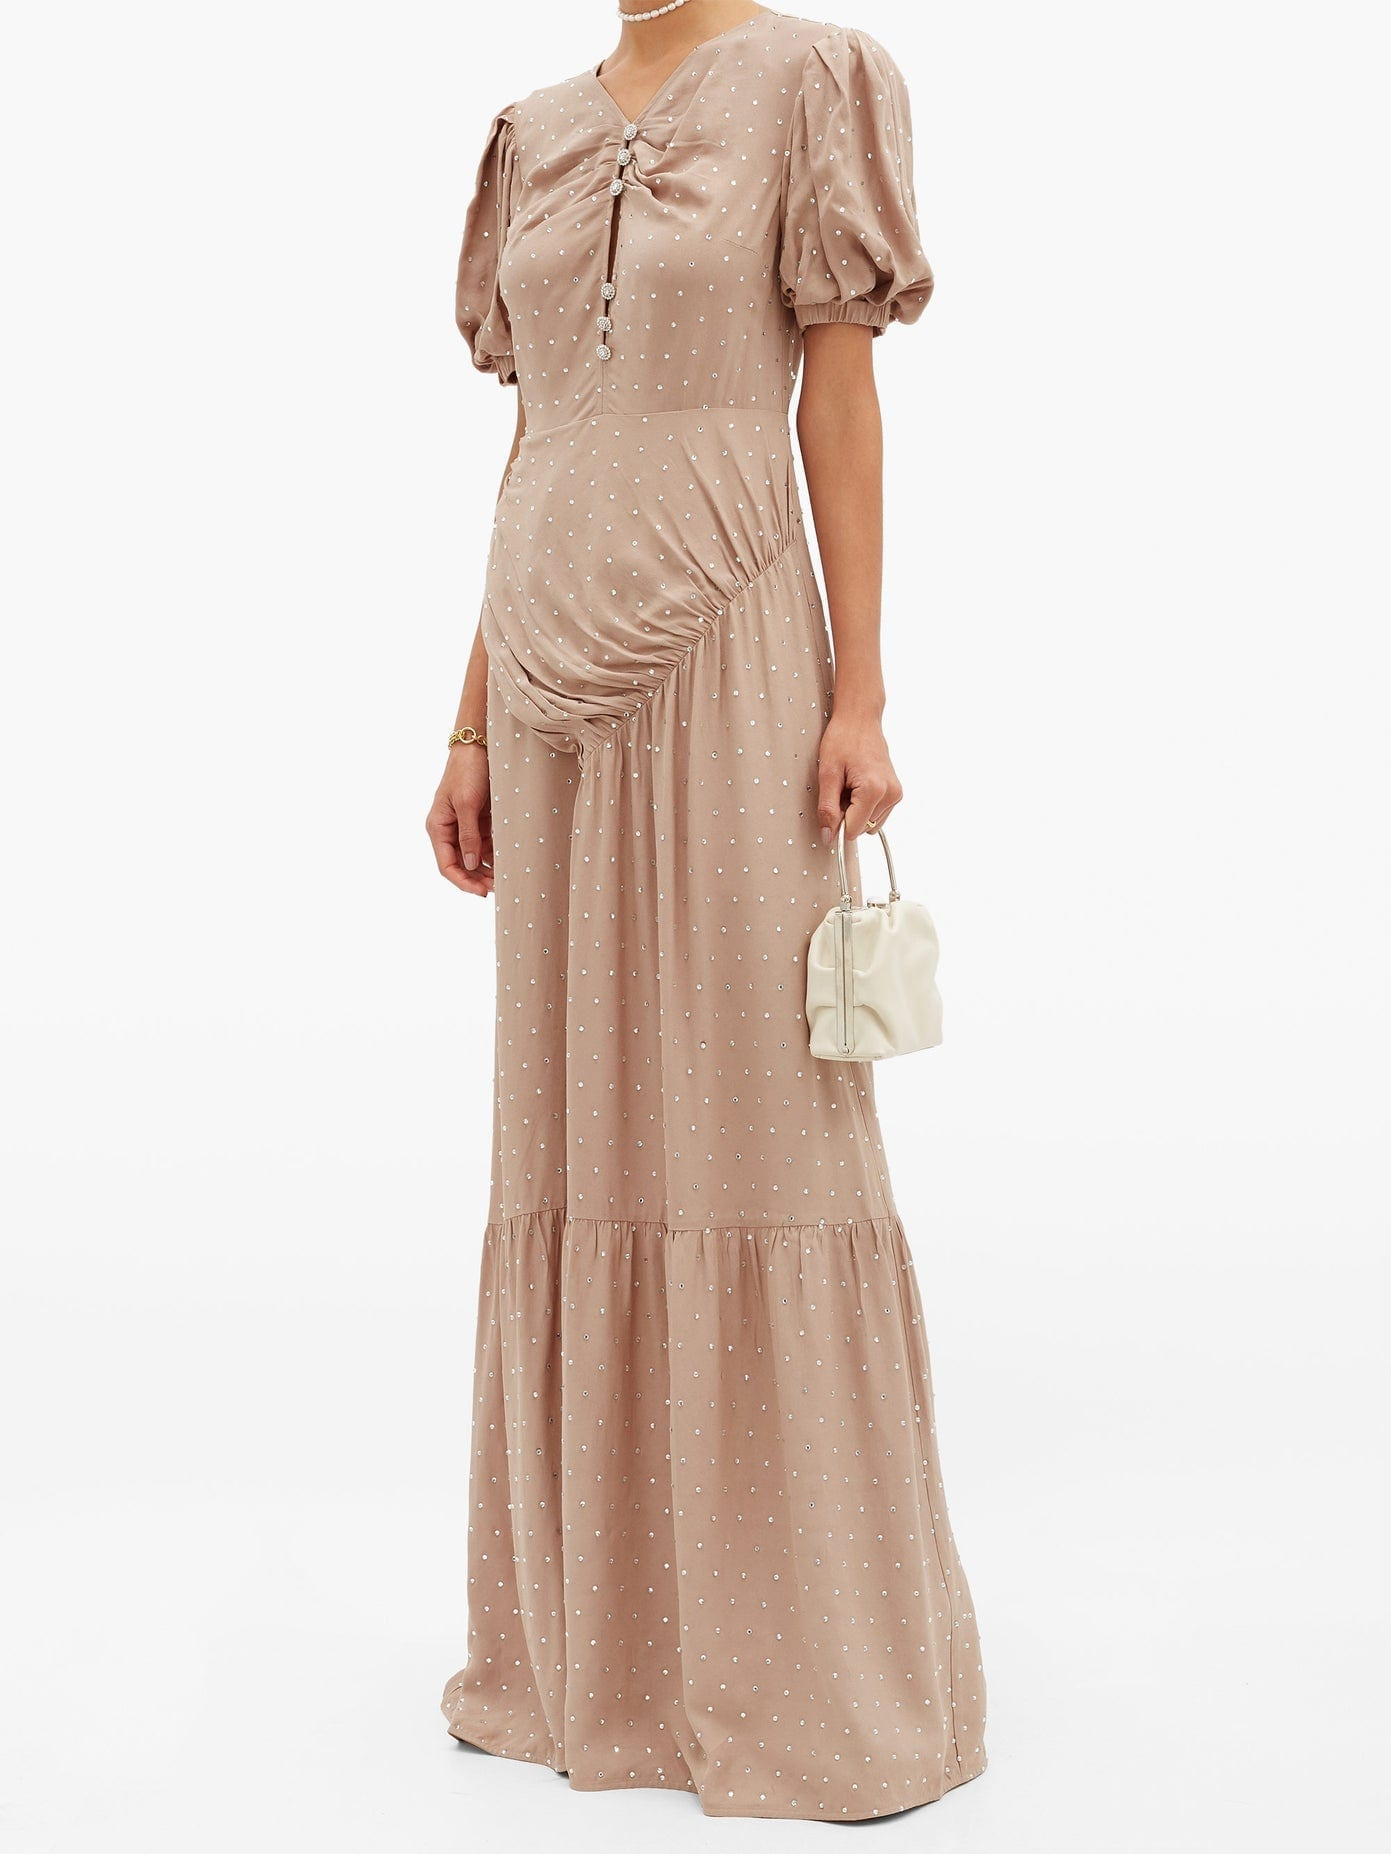 SELF-PORTRAIT Gathered Crystal-embellished Crepe Maxi Dress